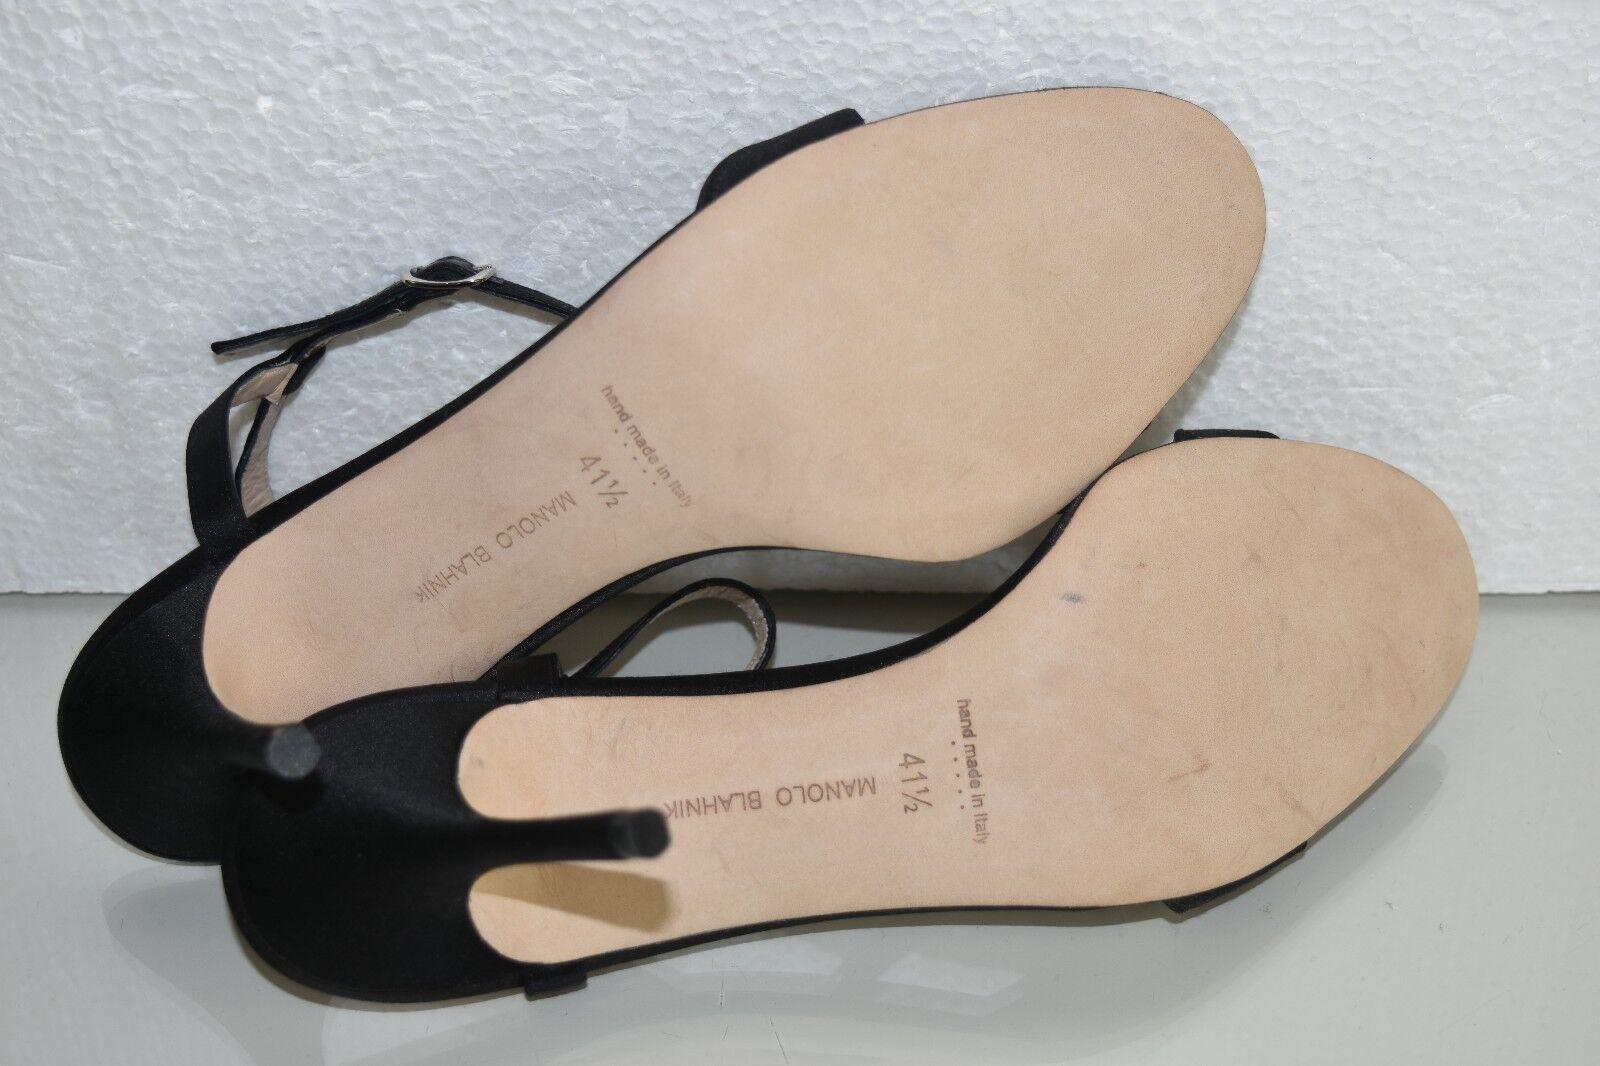 Neuf Manolo Blahnik Sandales Sangle Cheville Noir Orné Talons Talons Talons Chaussures Satin 885b1e